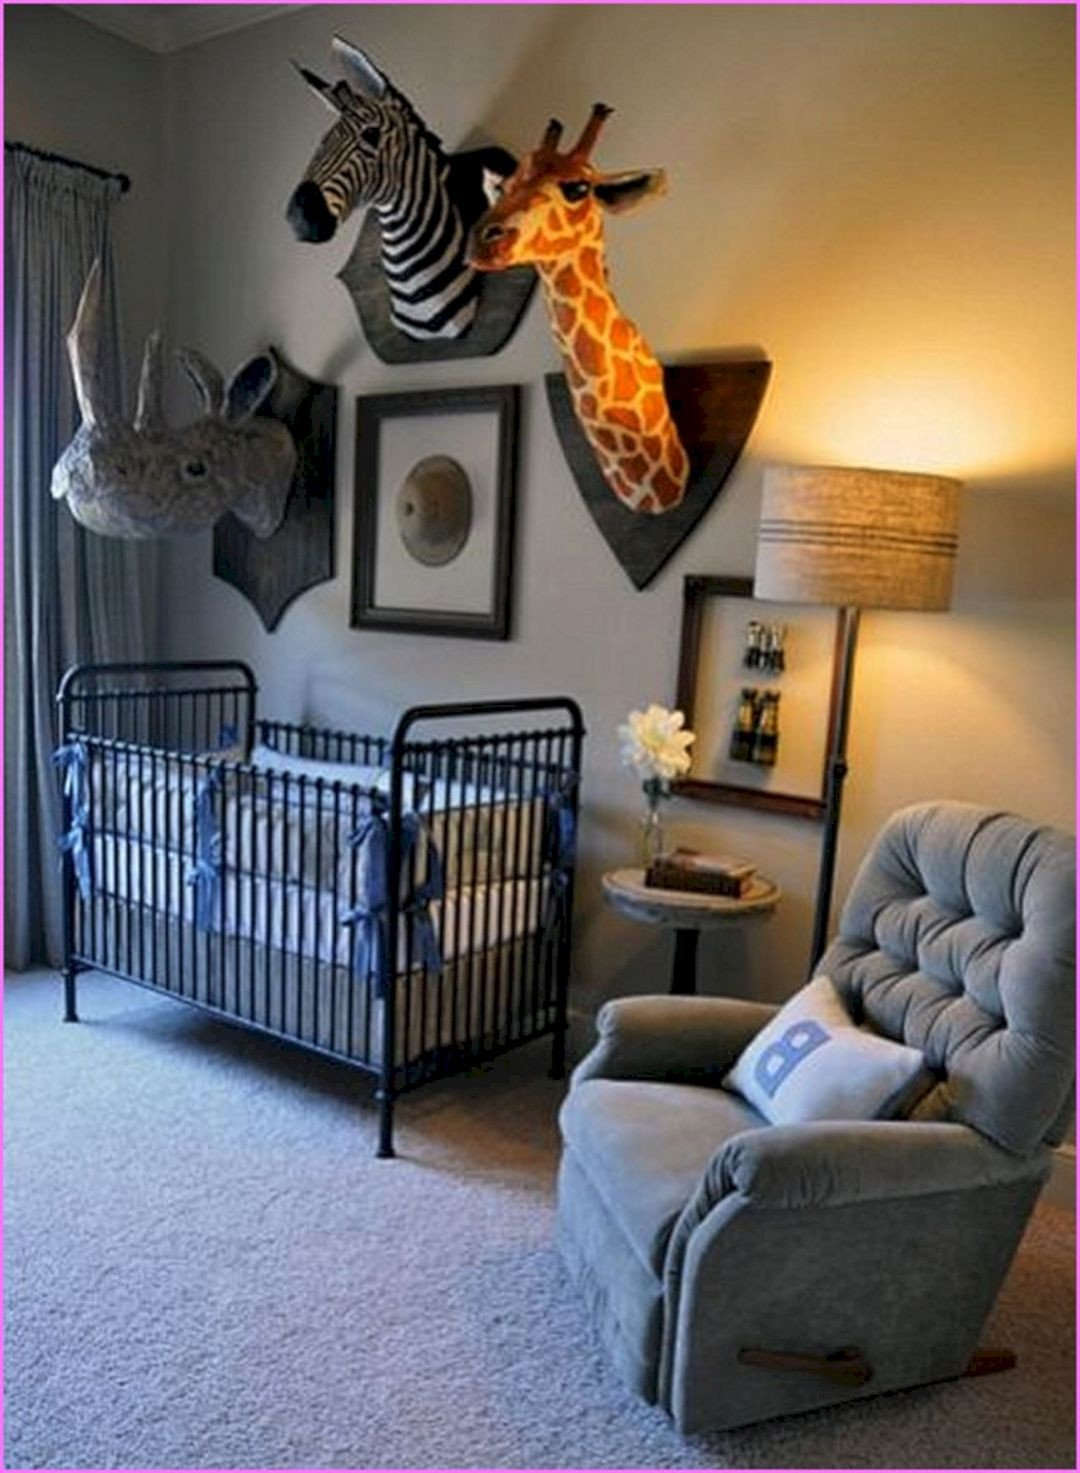 Baby Room Wall Decor Ideas Fresh Safari Baby Room Wall Decor Ideas Safari Baby Room Wall Decor Ideas Design Ideas and Photos